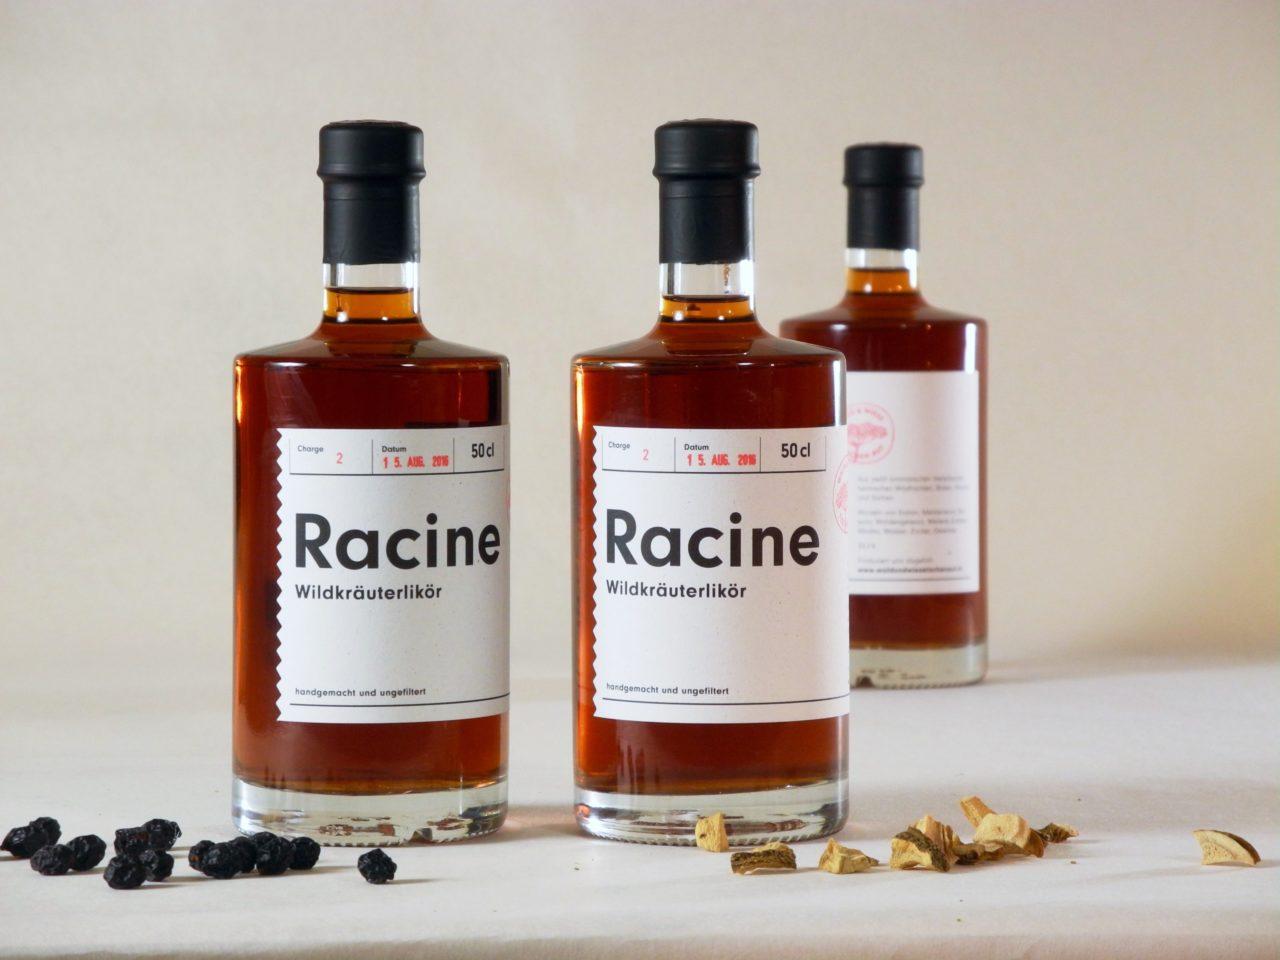 Racine - Wildkräuterlikör